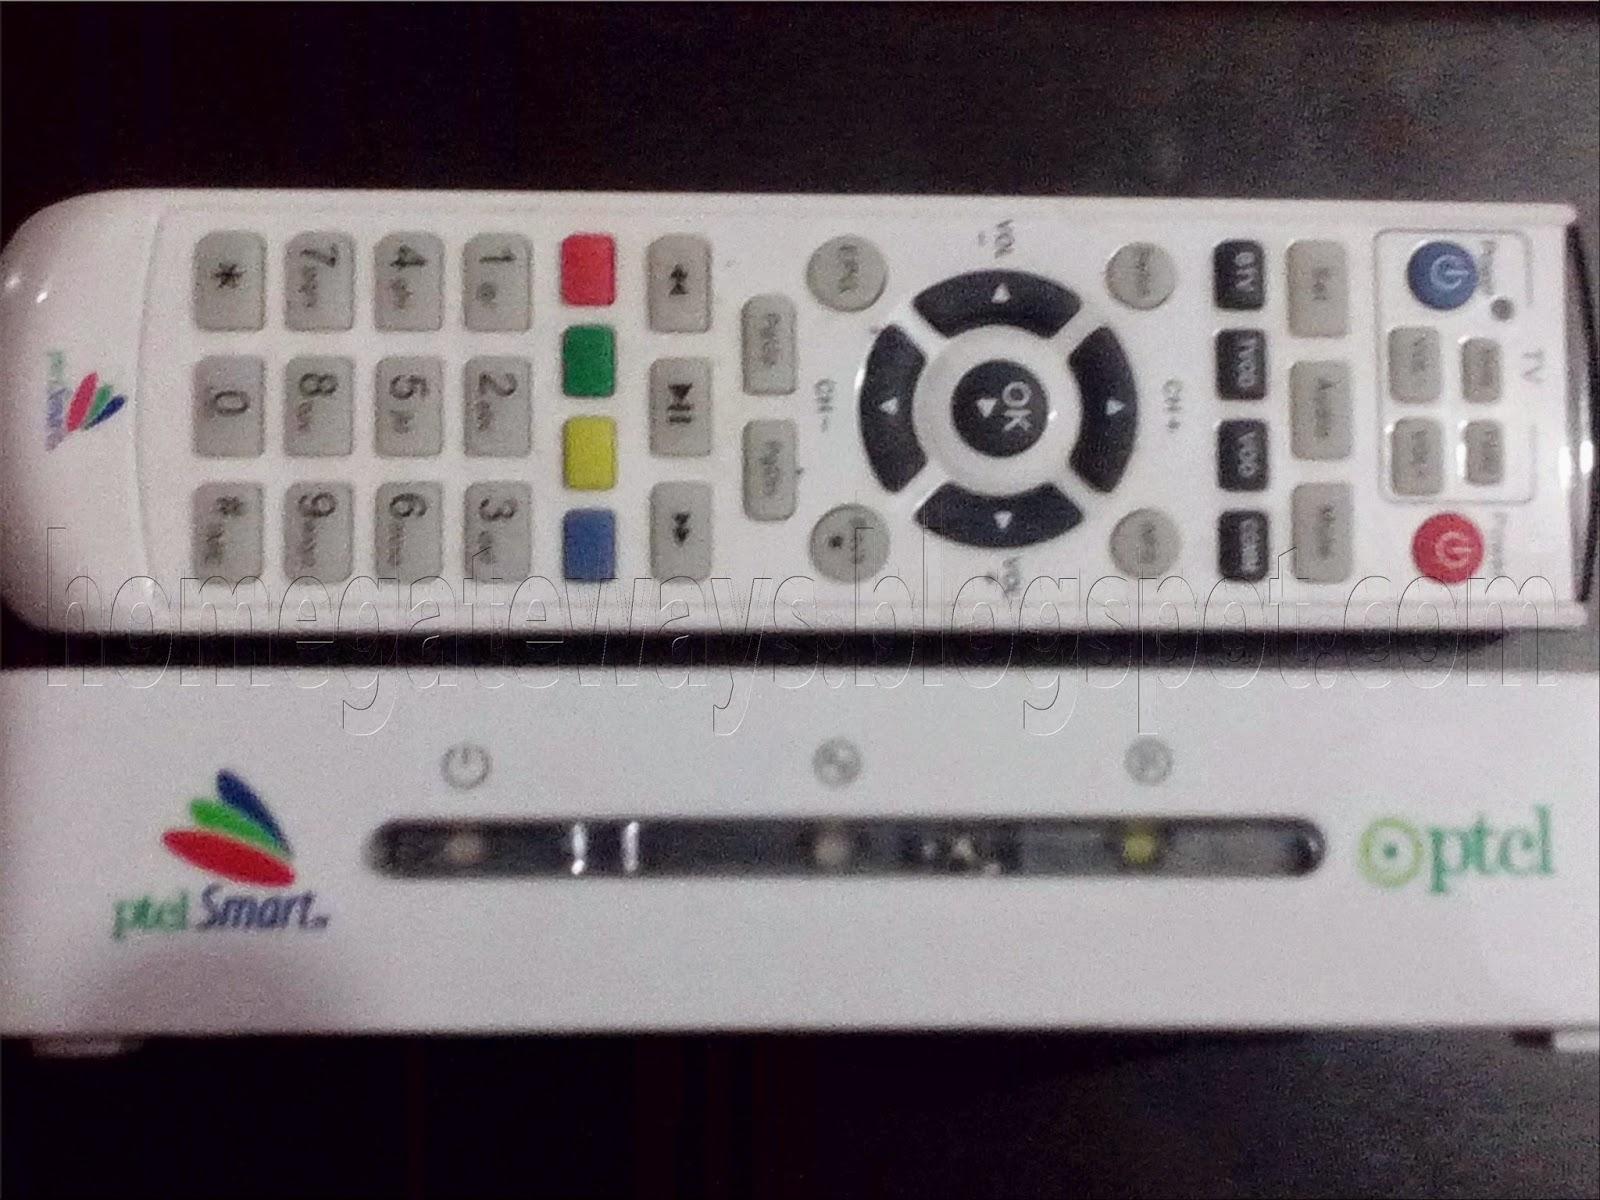 Home Gateway support: PTCL IPTV setup box configration